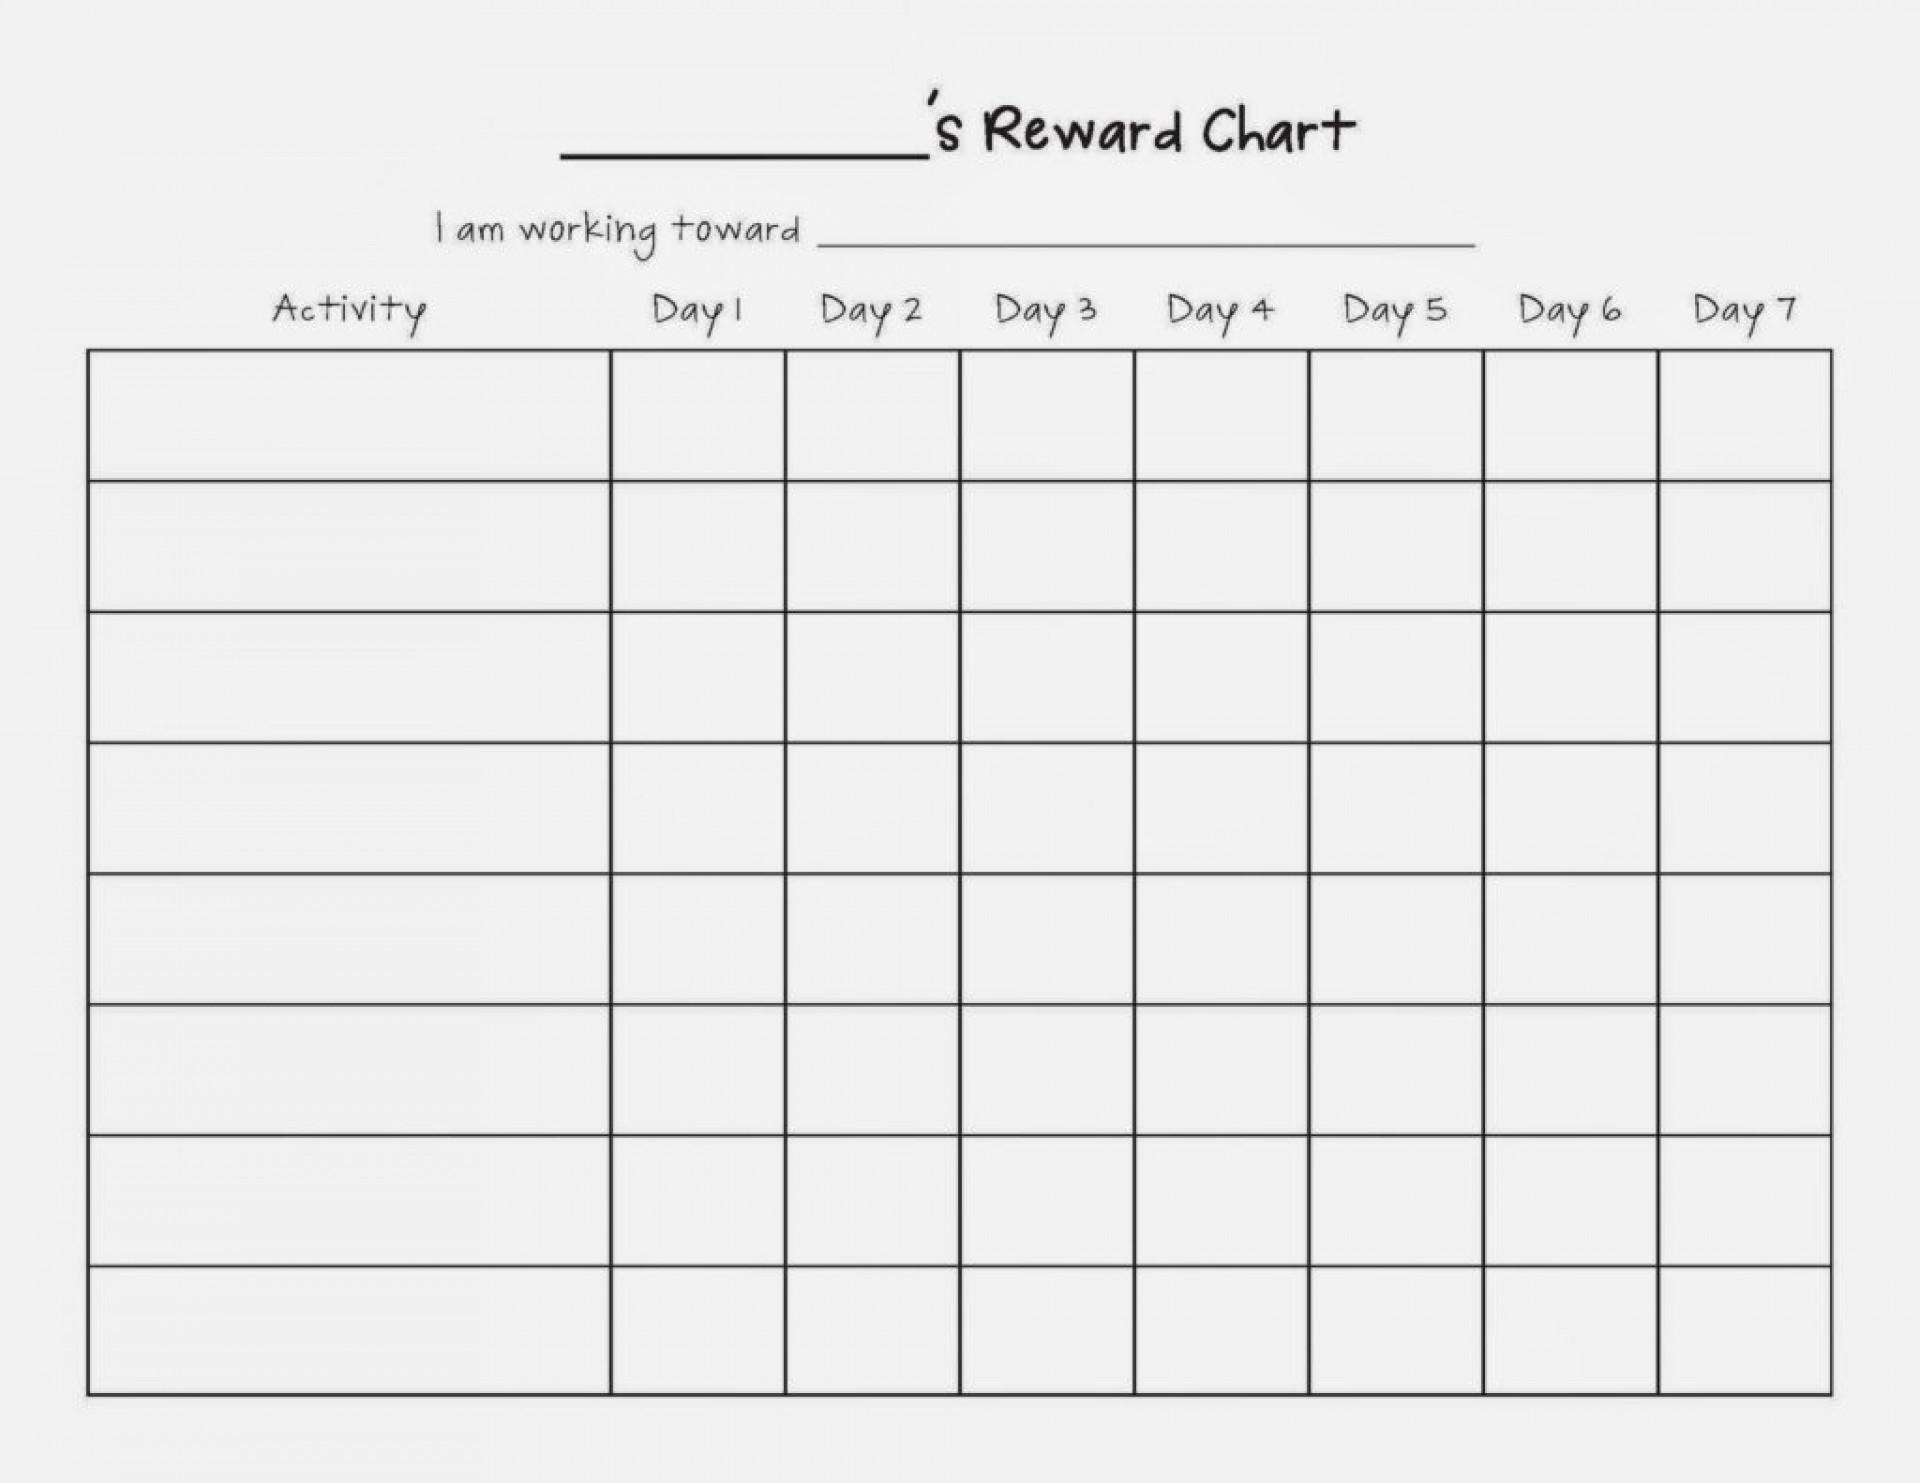 016 Uncategorized Free Weekly Reward Chart Blank Template For Children 1024x791 Essay Example Amazing Reword Generator 1920